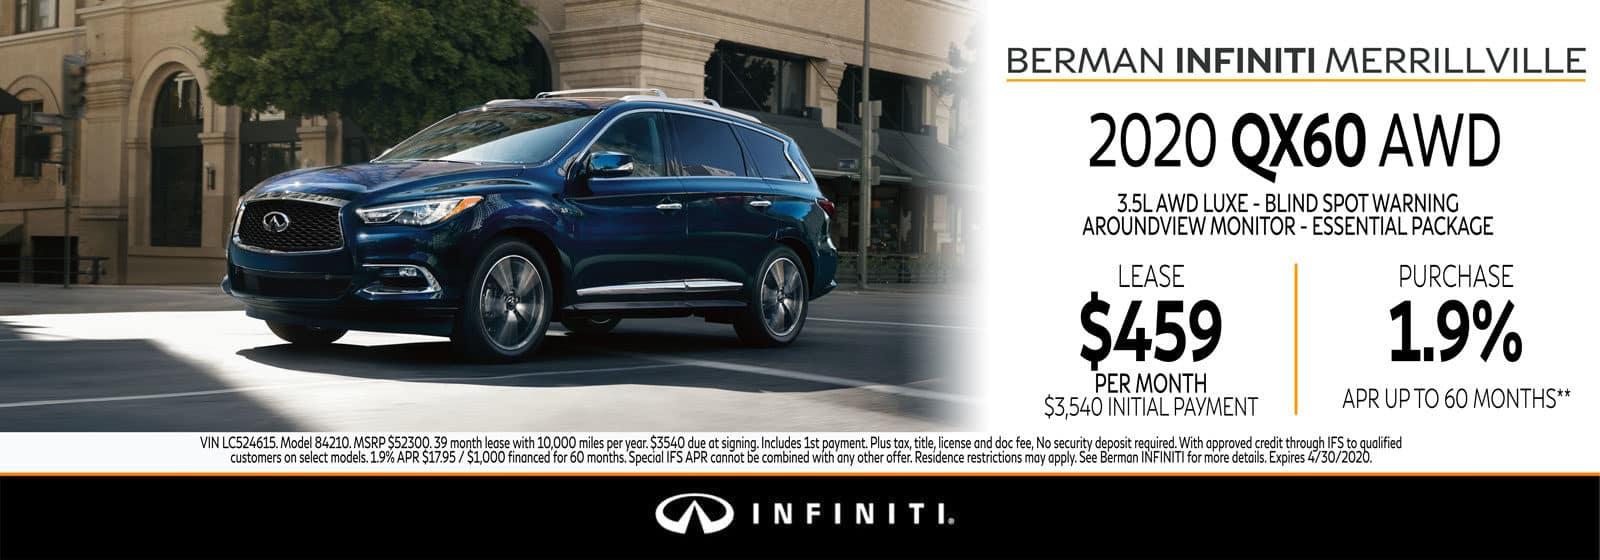 New 2020 INFINITI QX60 April Offer at Berman INFINITI of Merrillville!